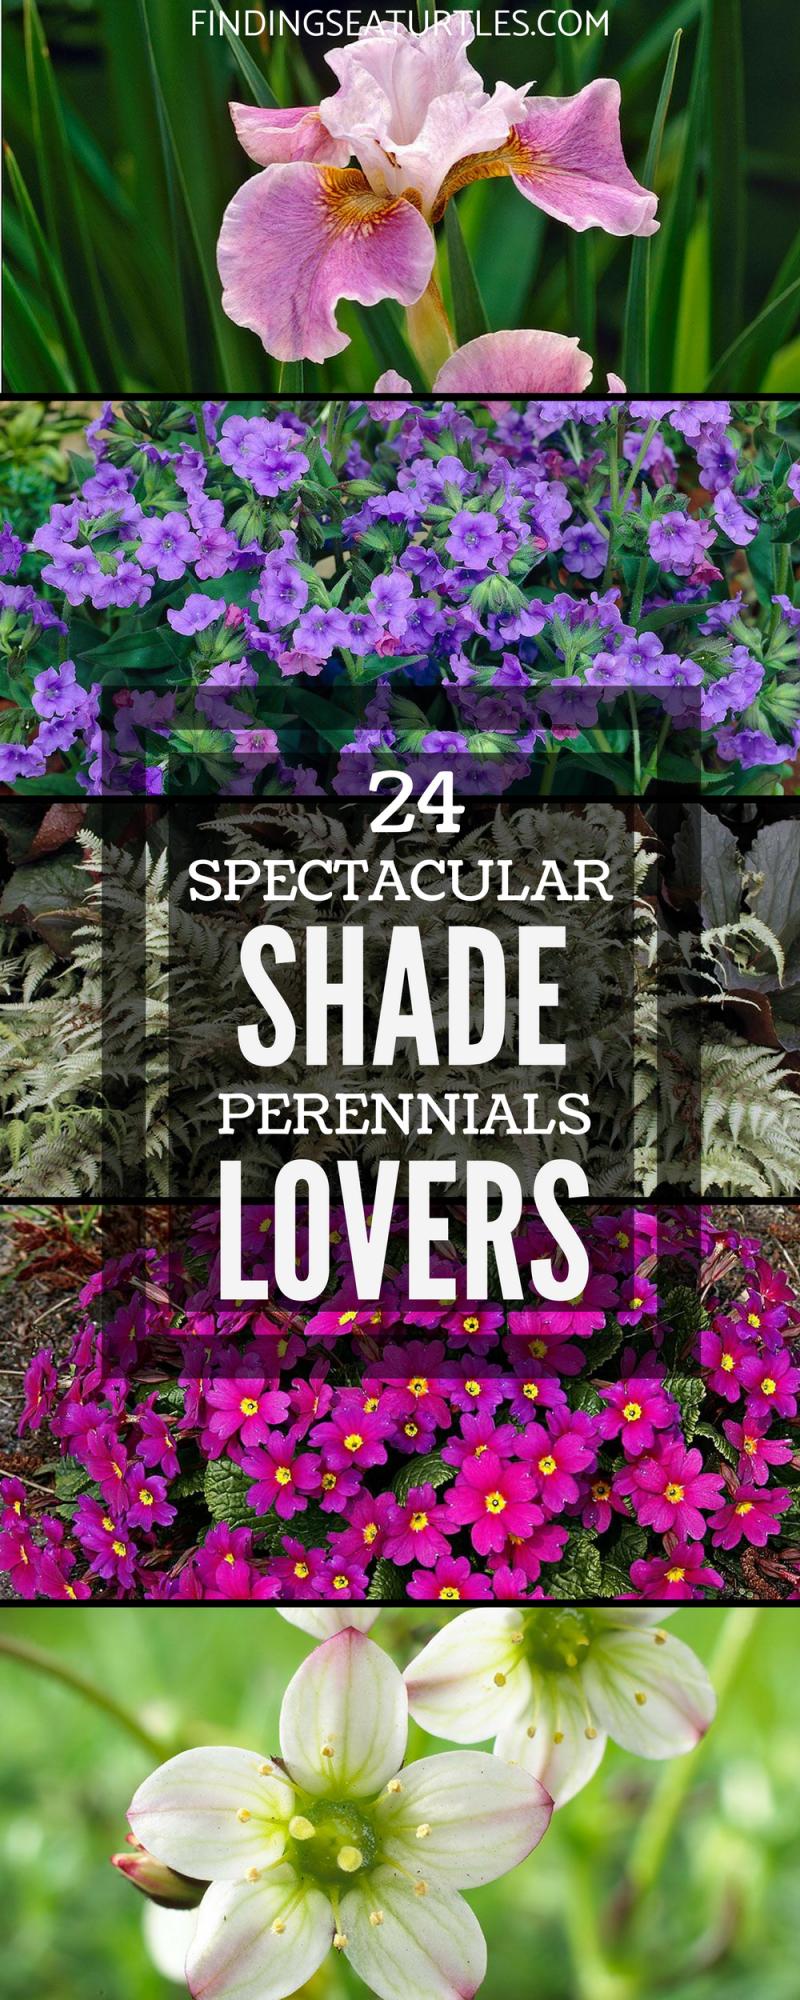 24 Spectacular Shade Garden Perennials - Finding Sea Turtles